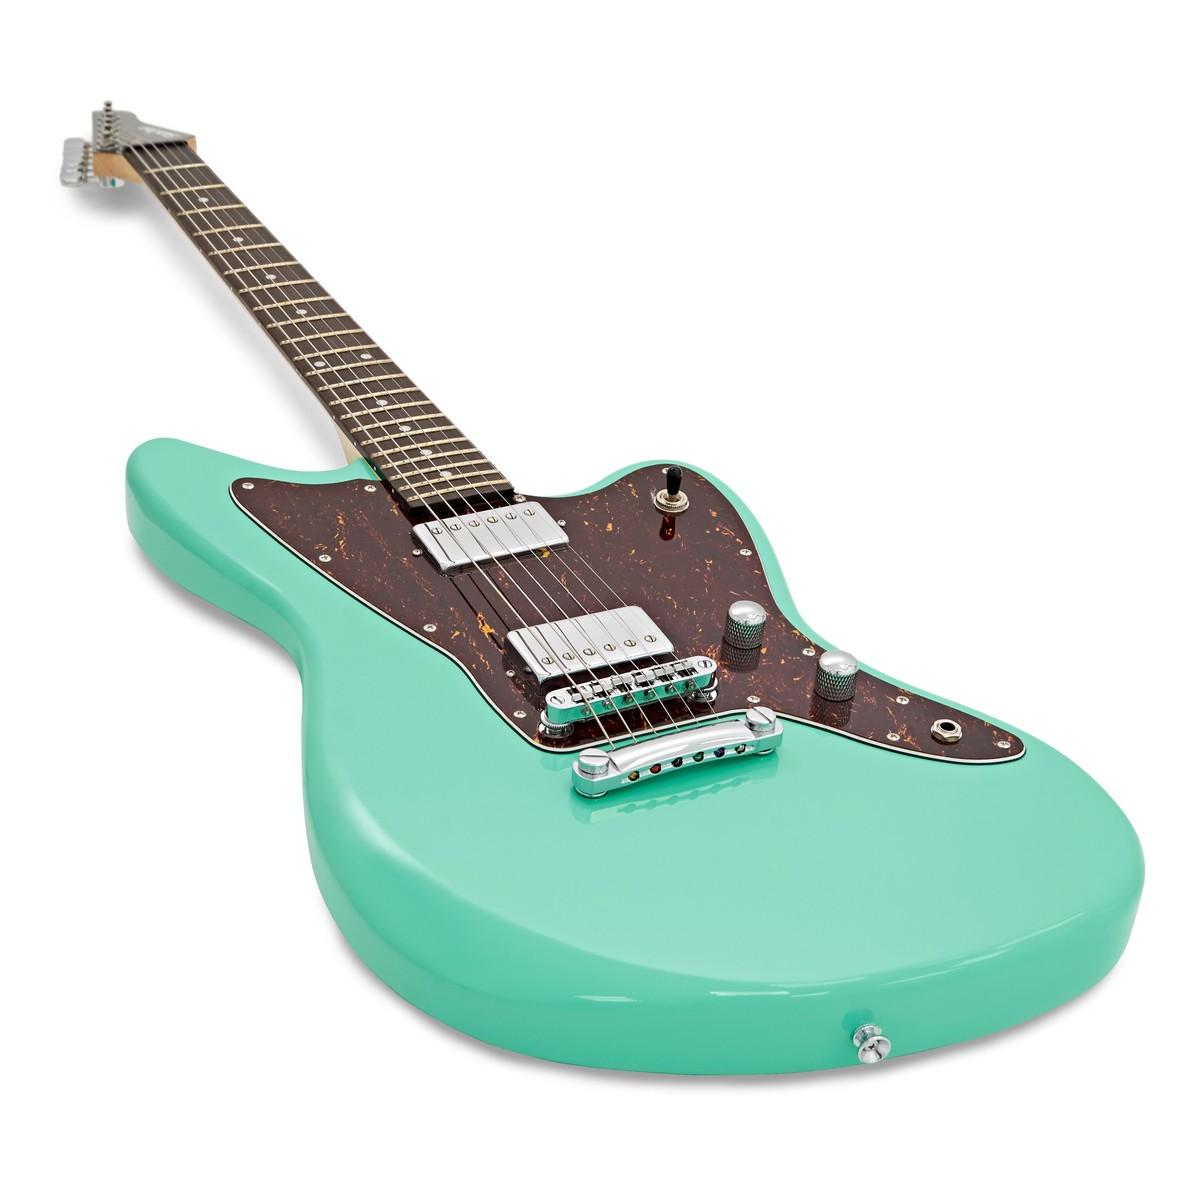 6CC7 Wiring Diagram Rogue Bass Guitar   Wiring ResourcesWiring Resources